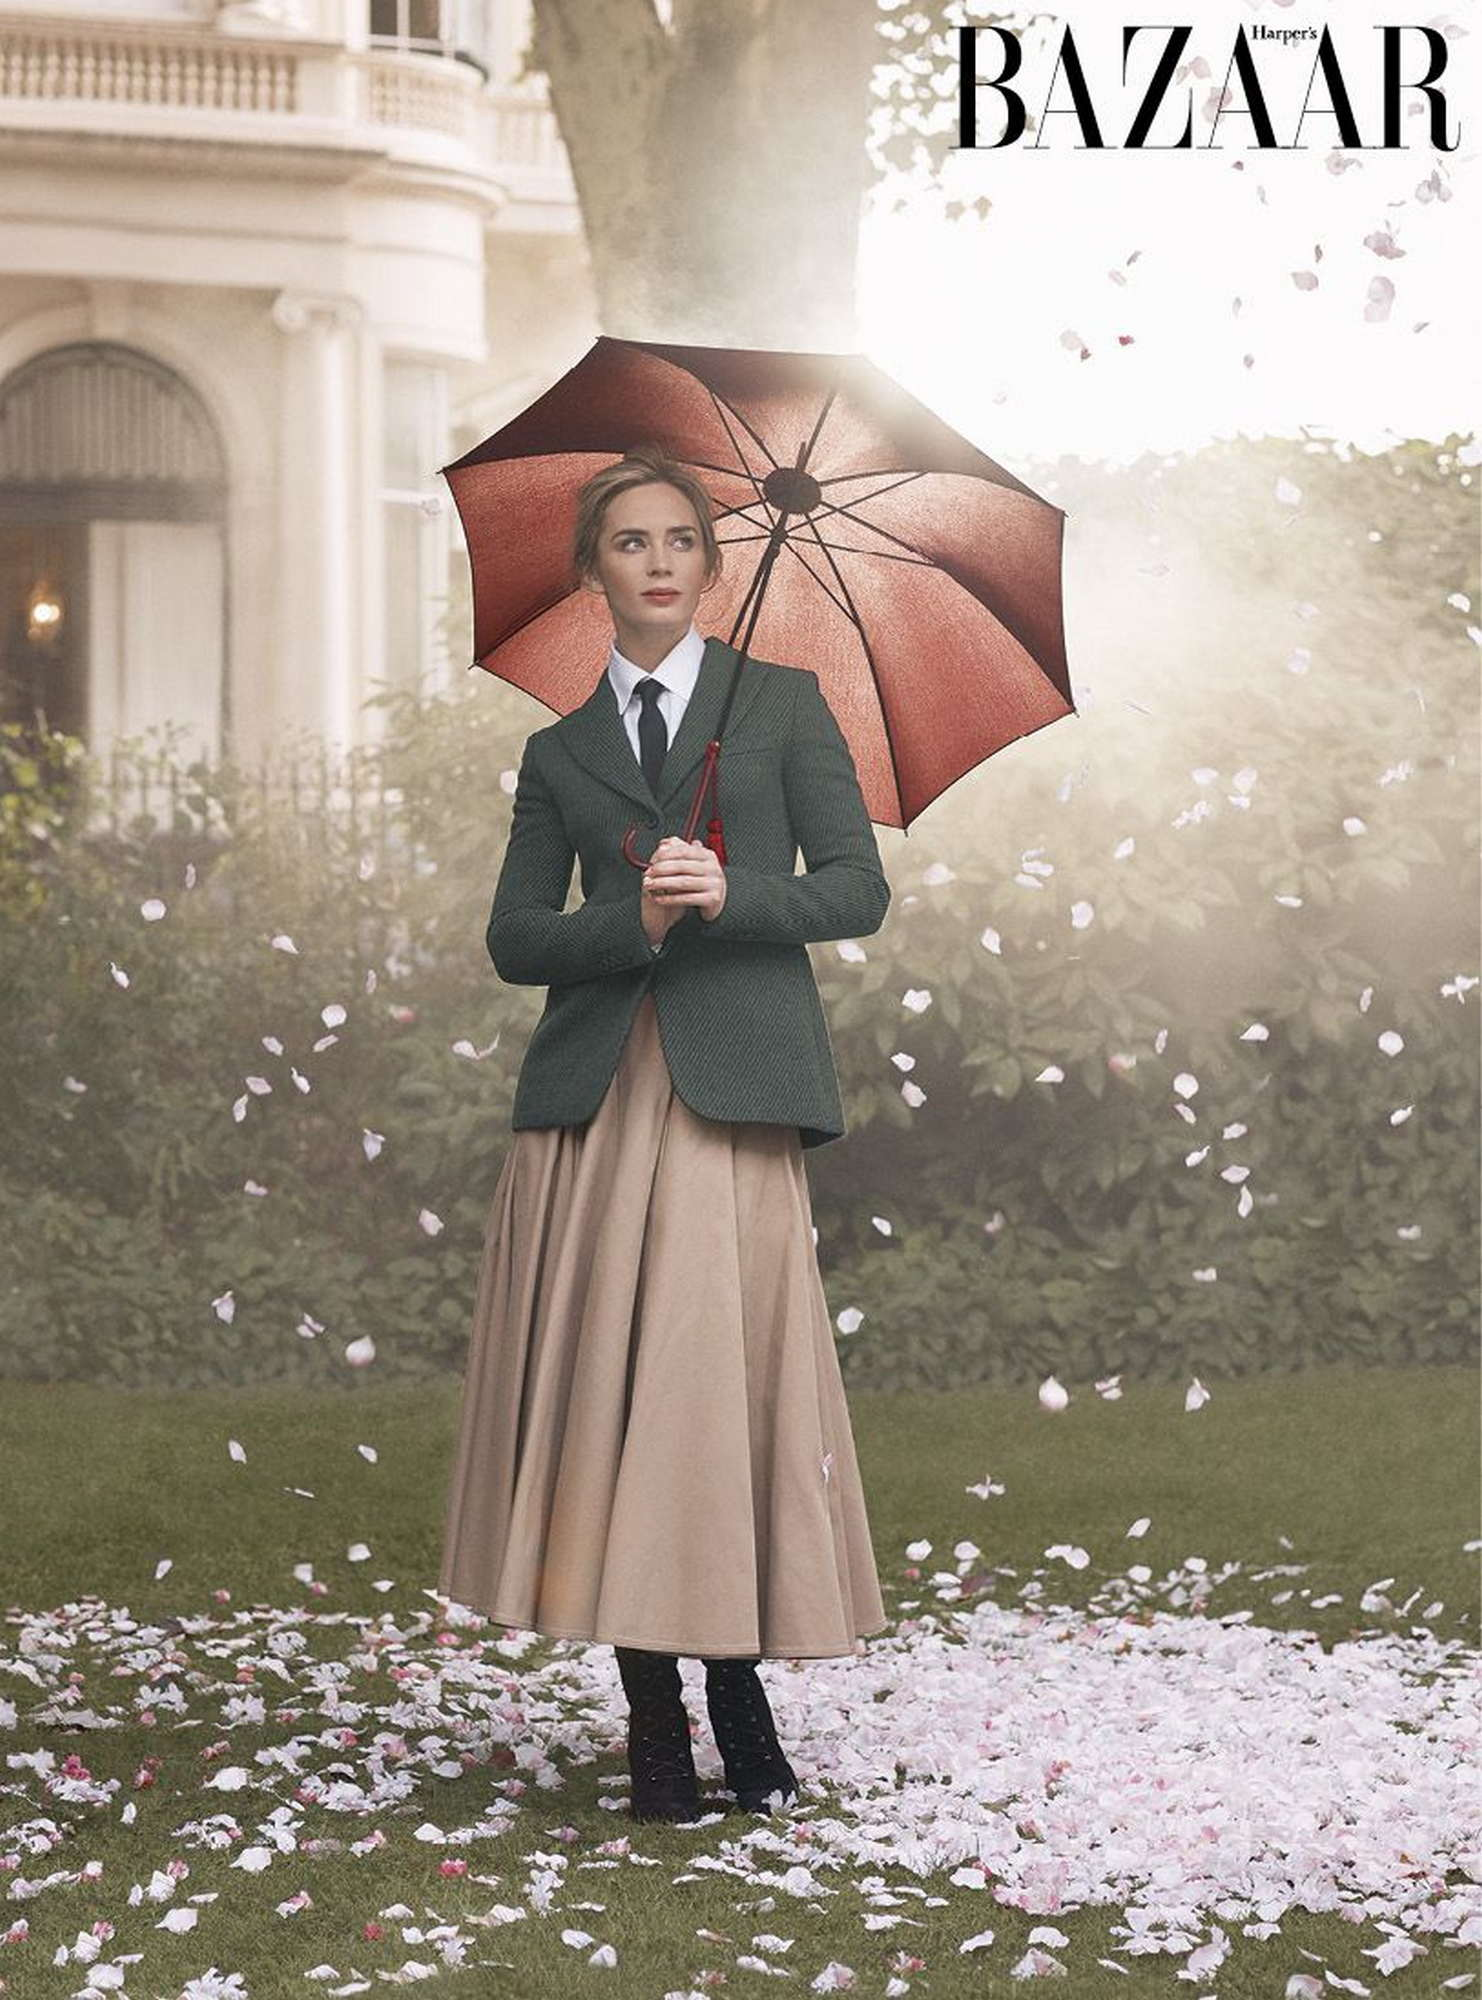 Emily-Blunt-Harpers-Bazaar-UK-January-20193.jpg